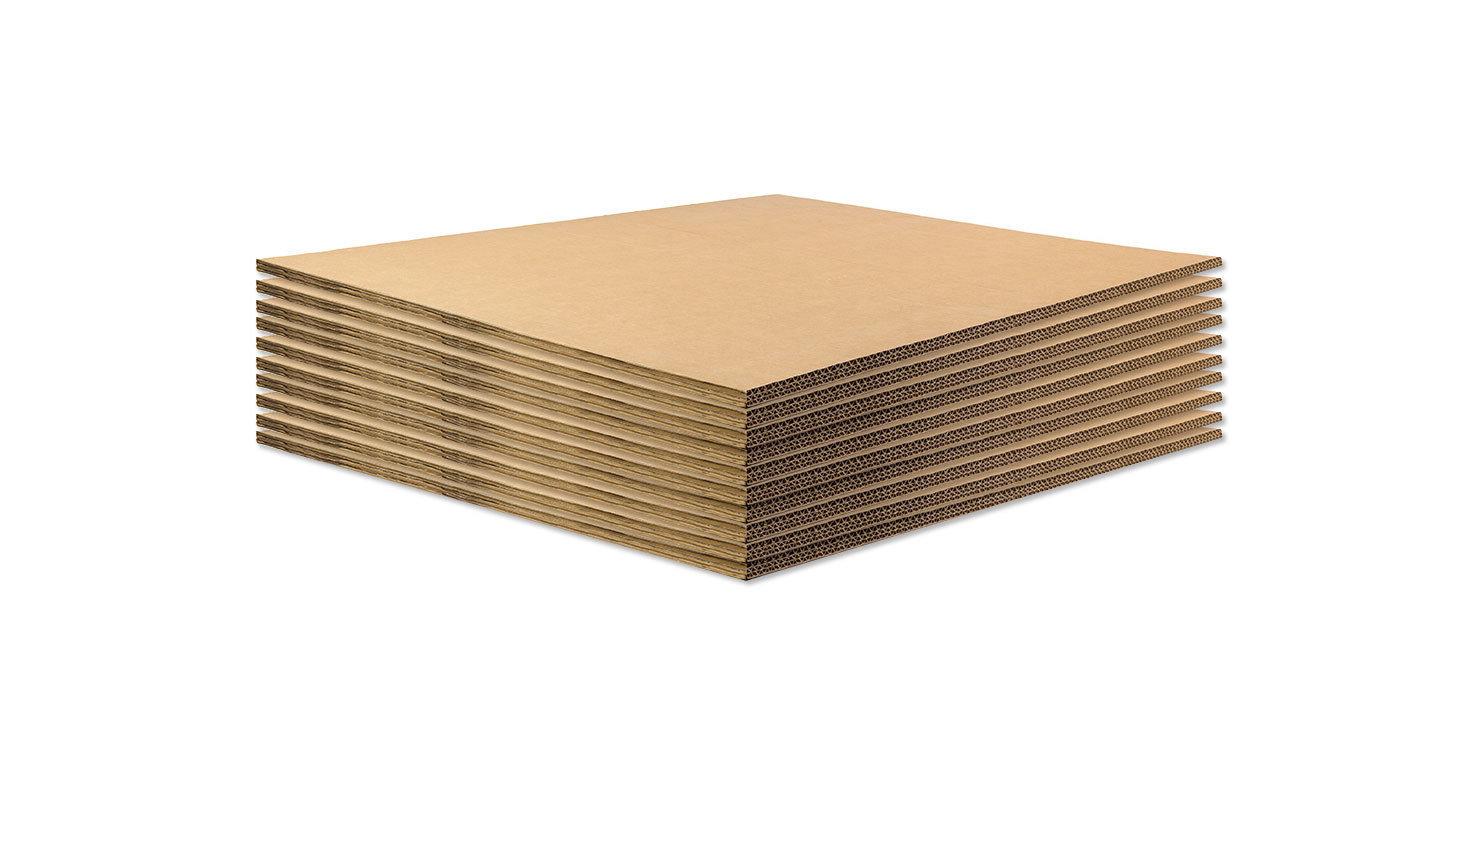 BASE IN CARTONE per ECOPALLET 80x60cm x 14mm • 10 pezzi